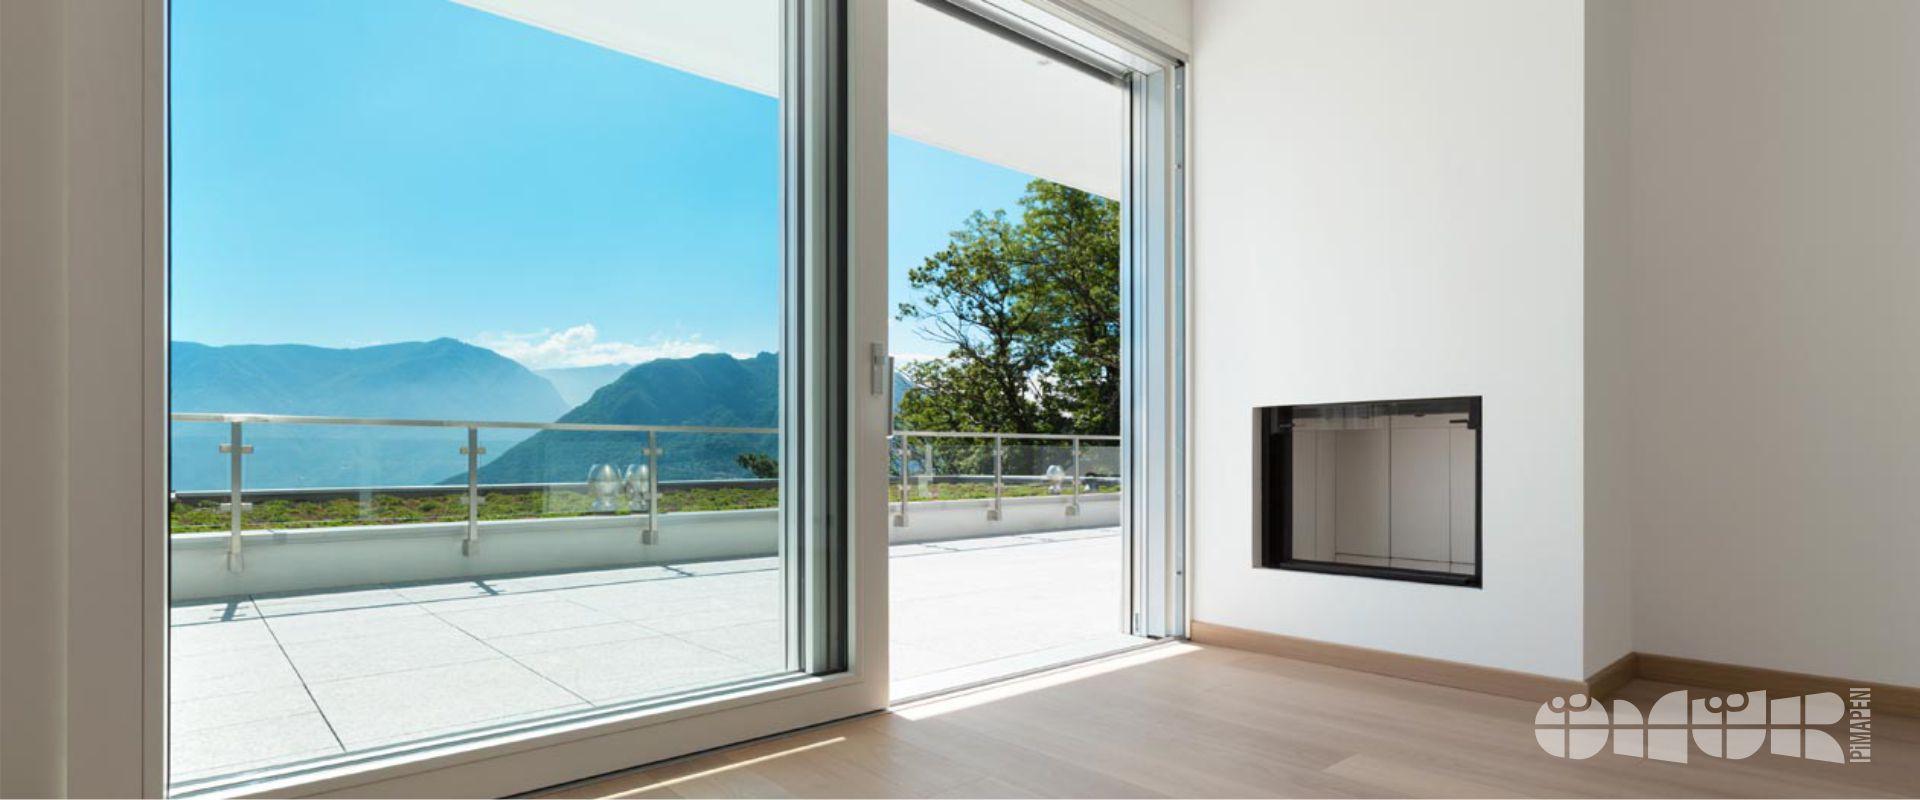 pimapen 1 - Halkalı Pvc Pencere